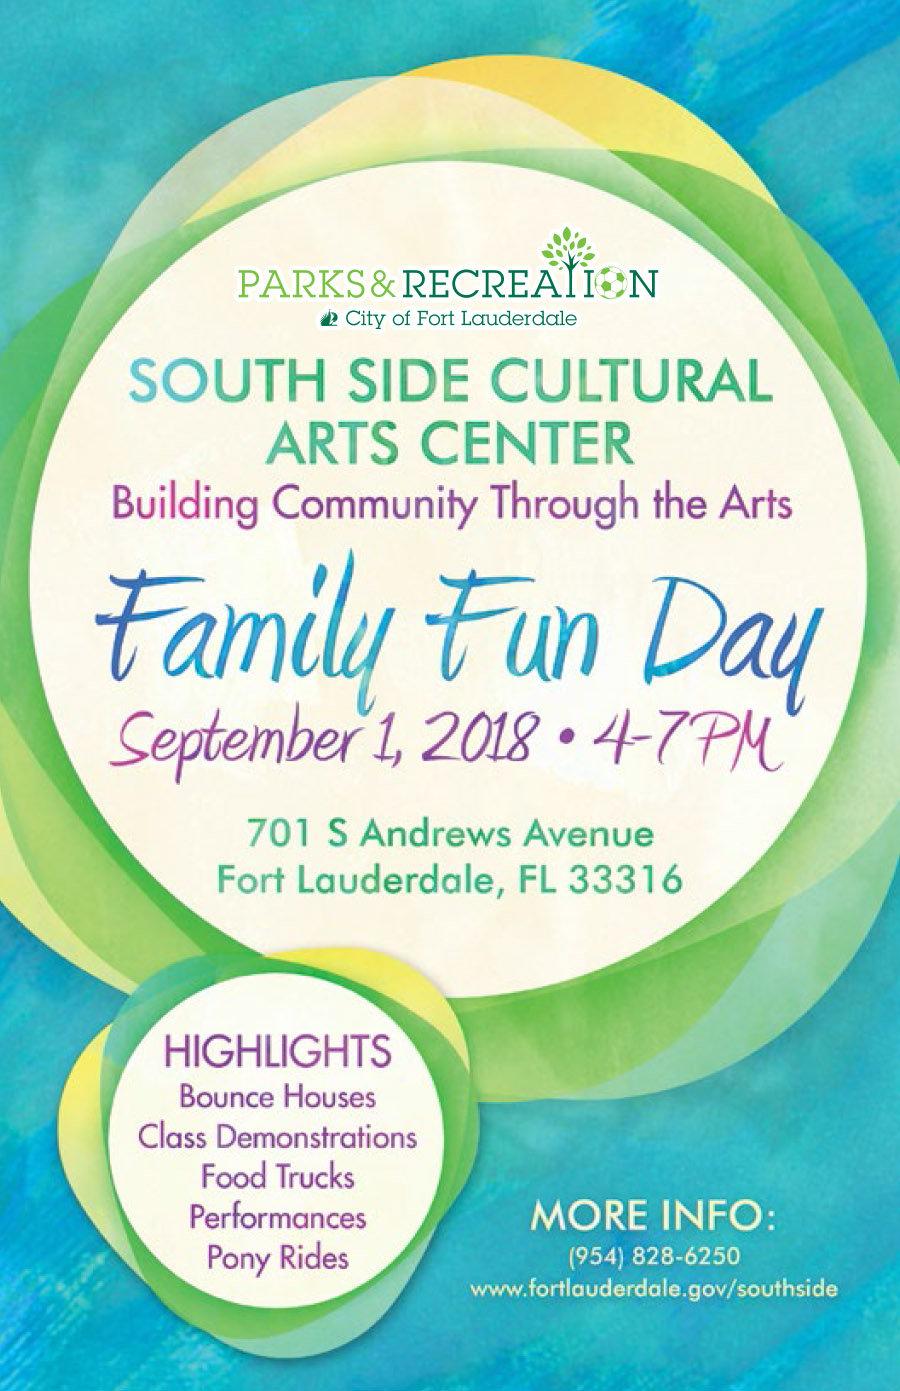 4748 PR Family Fun Day South Side_Card 5